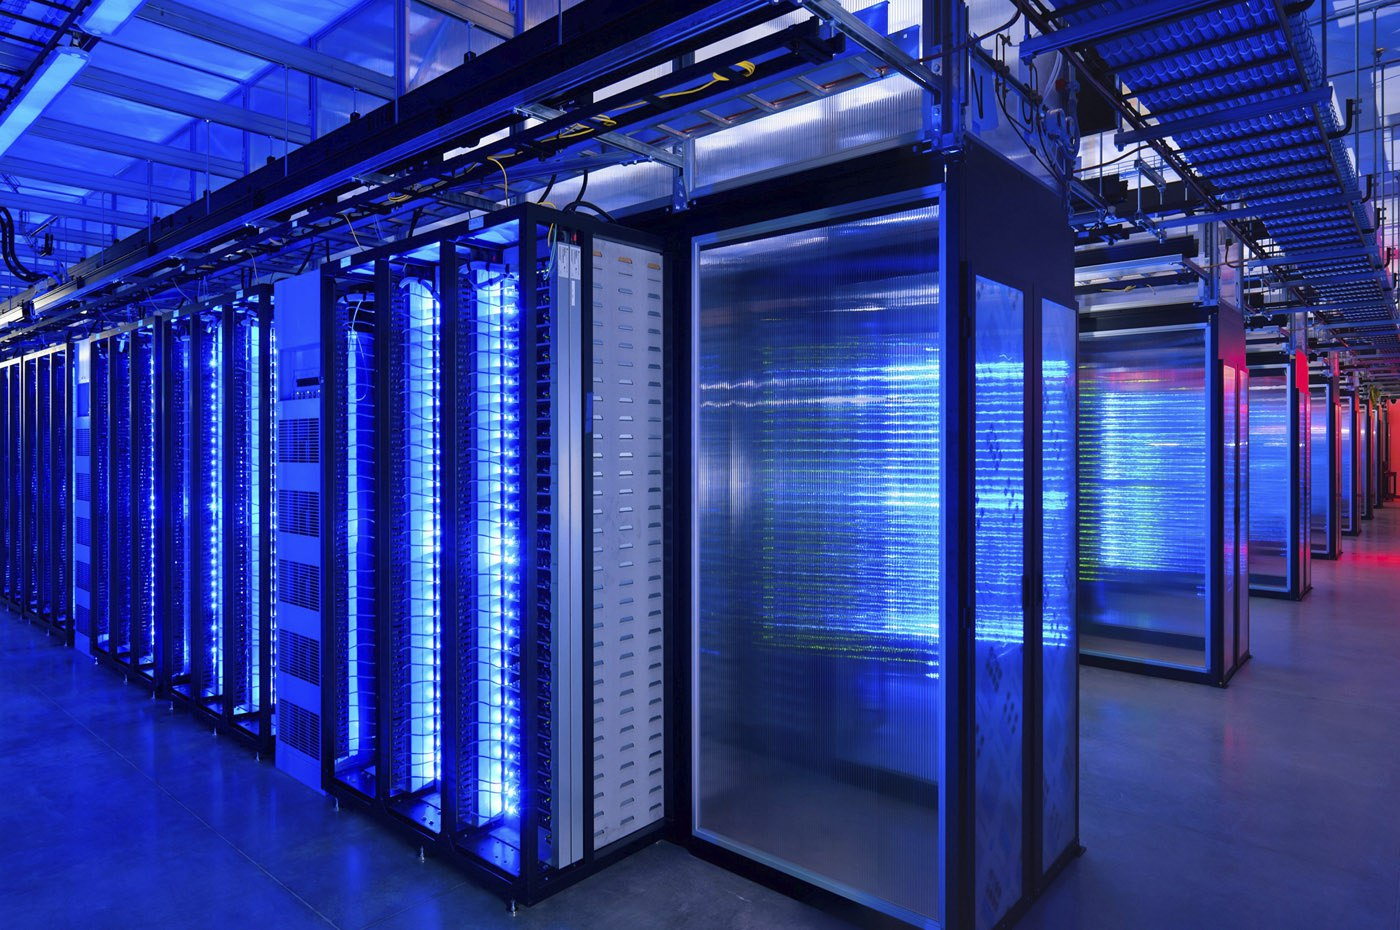 Can A Pure Storage Company Make It Big?